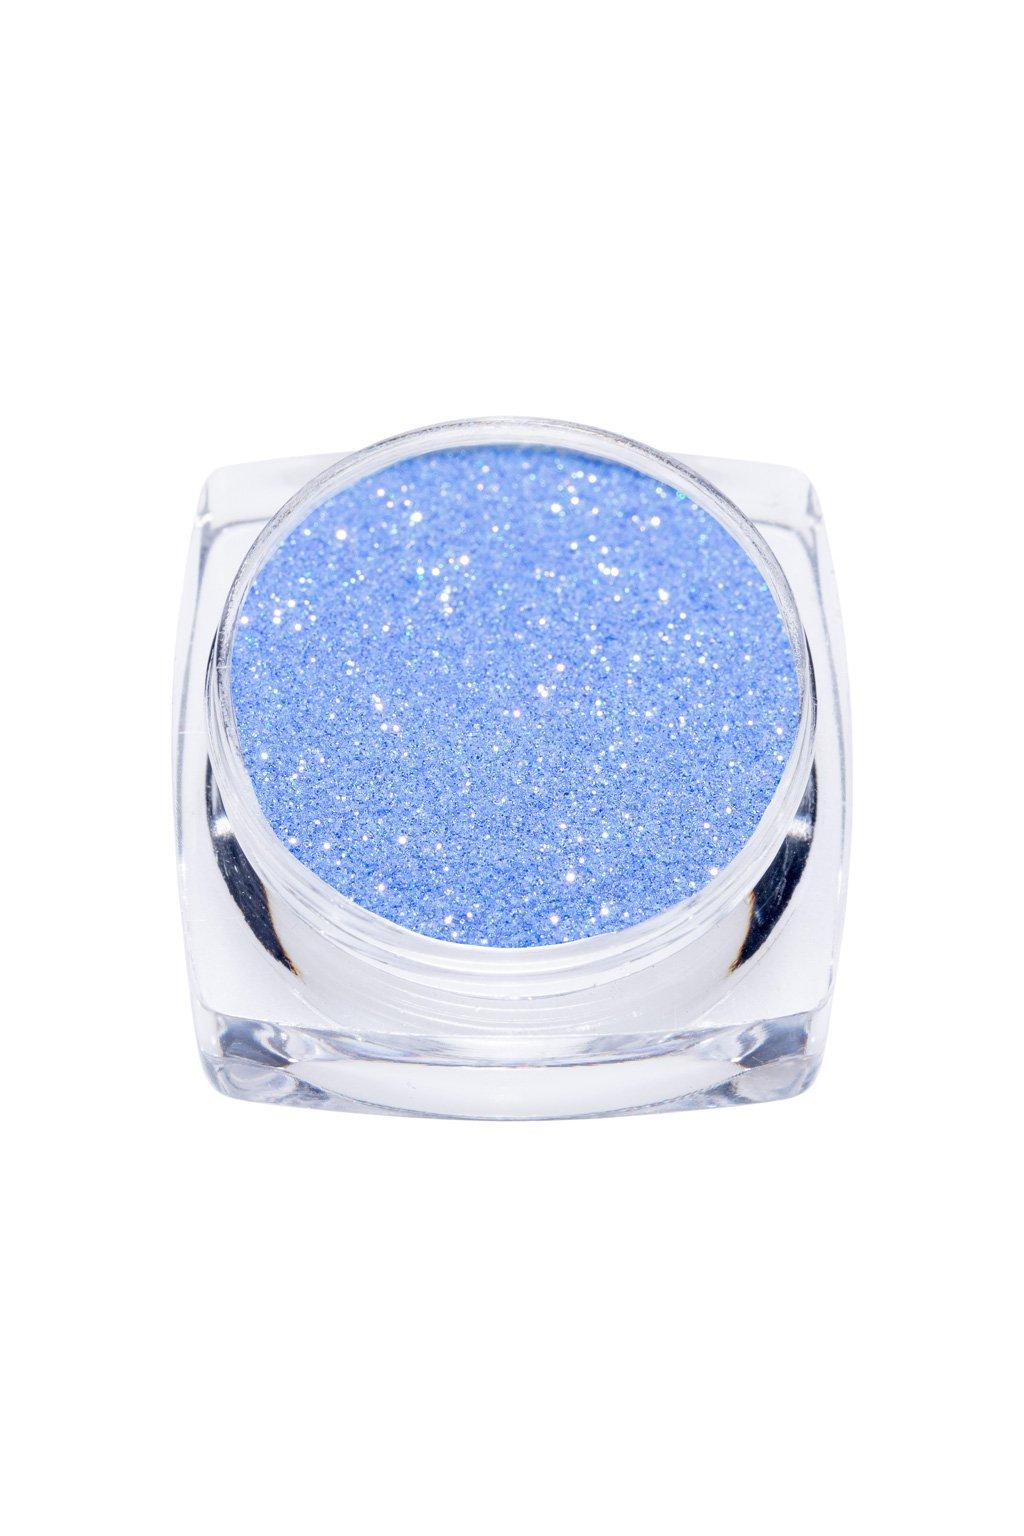 23438 trpyt fantasy blue